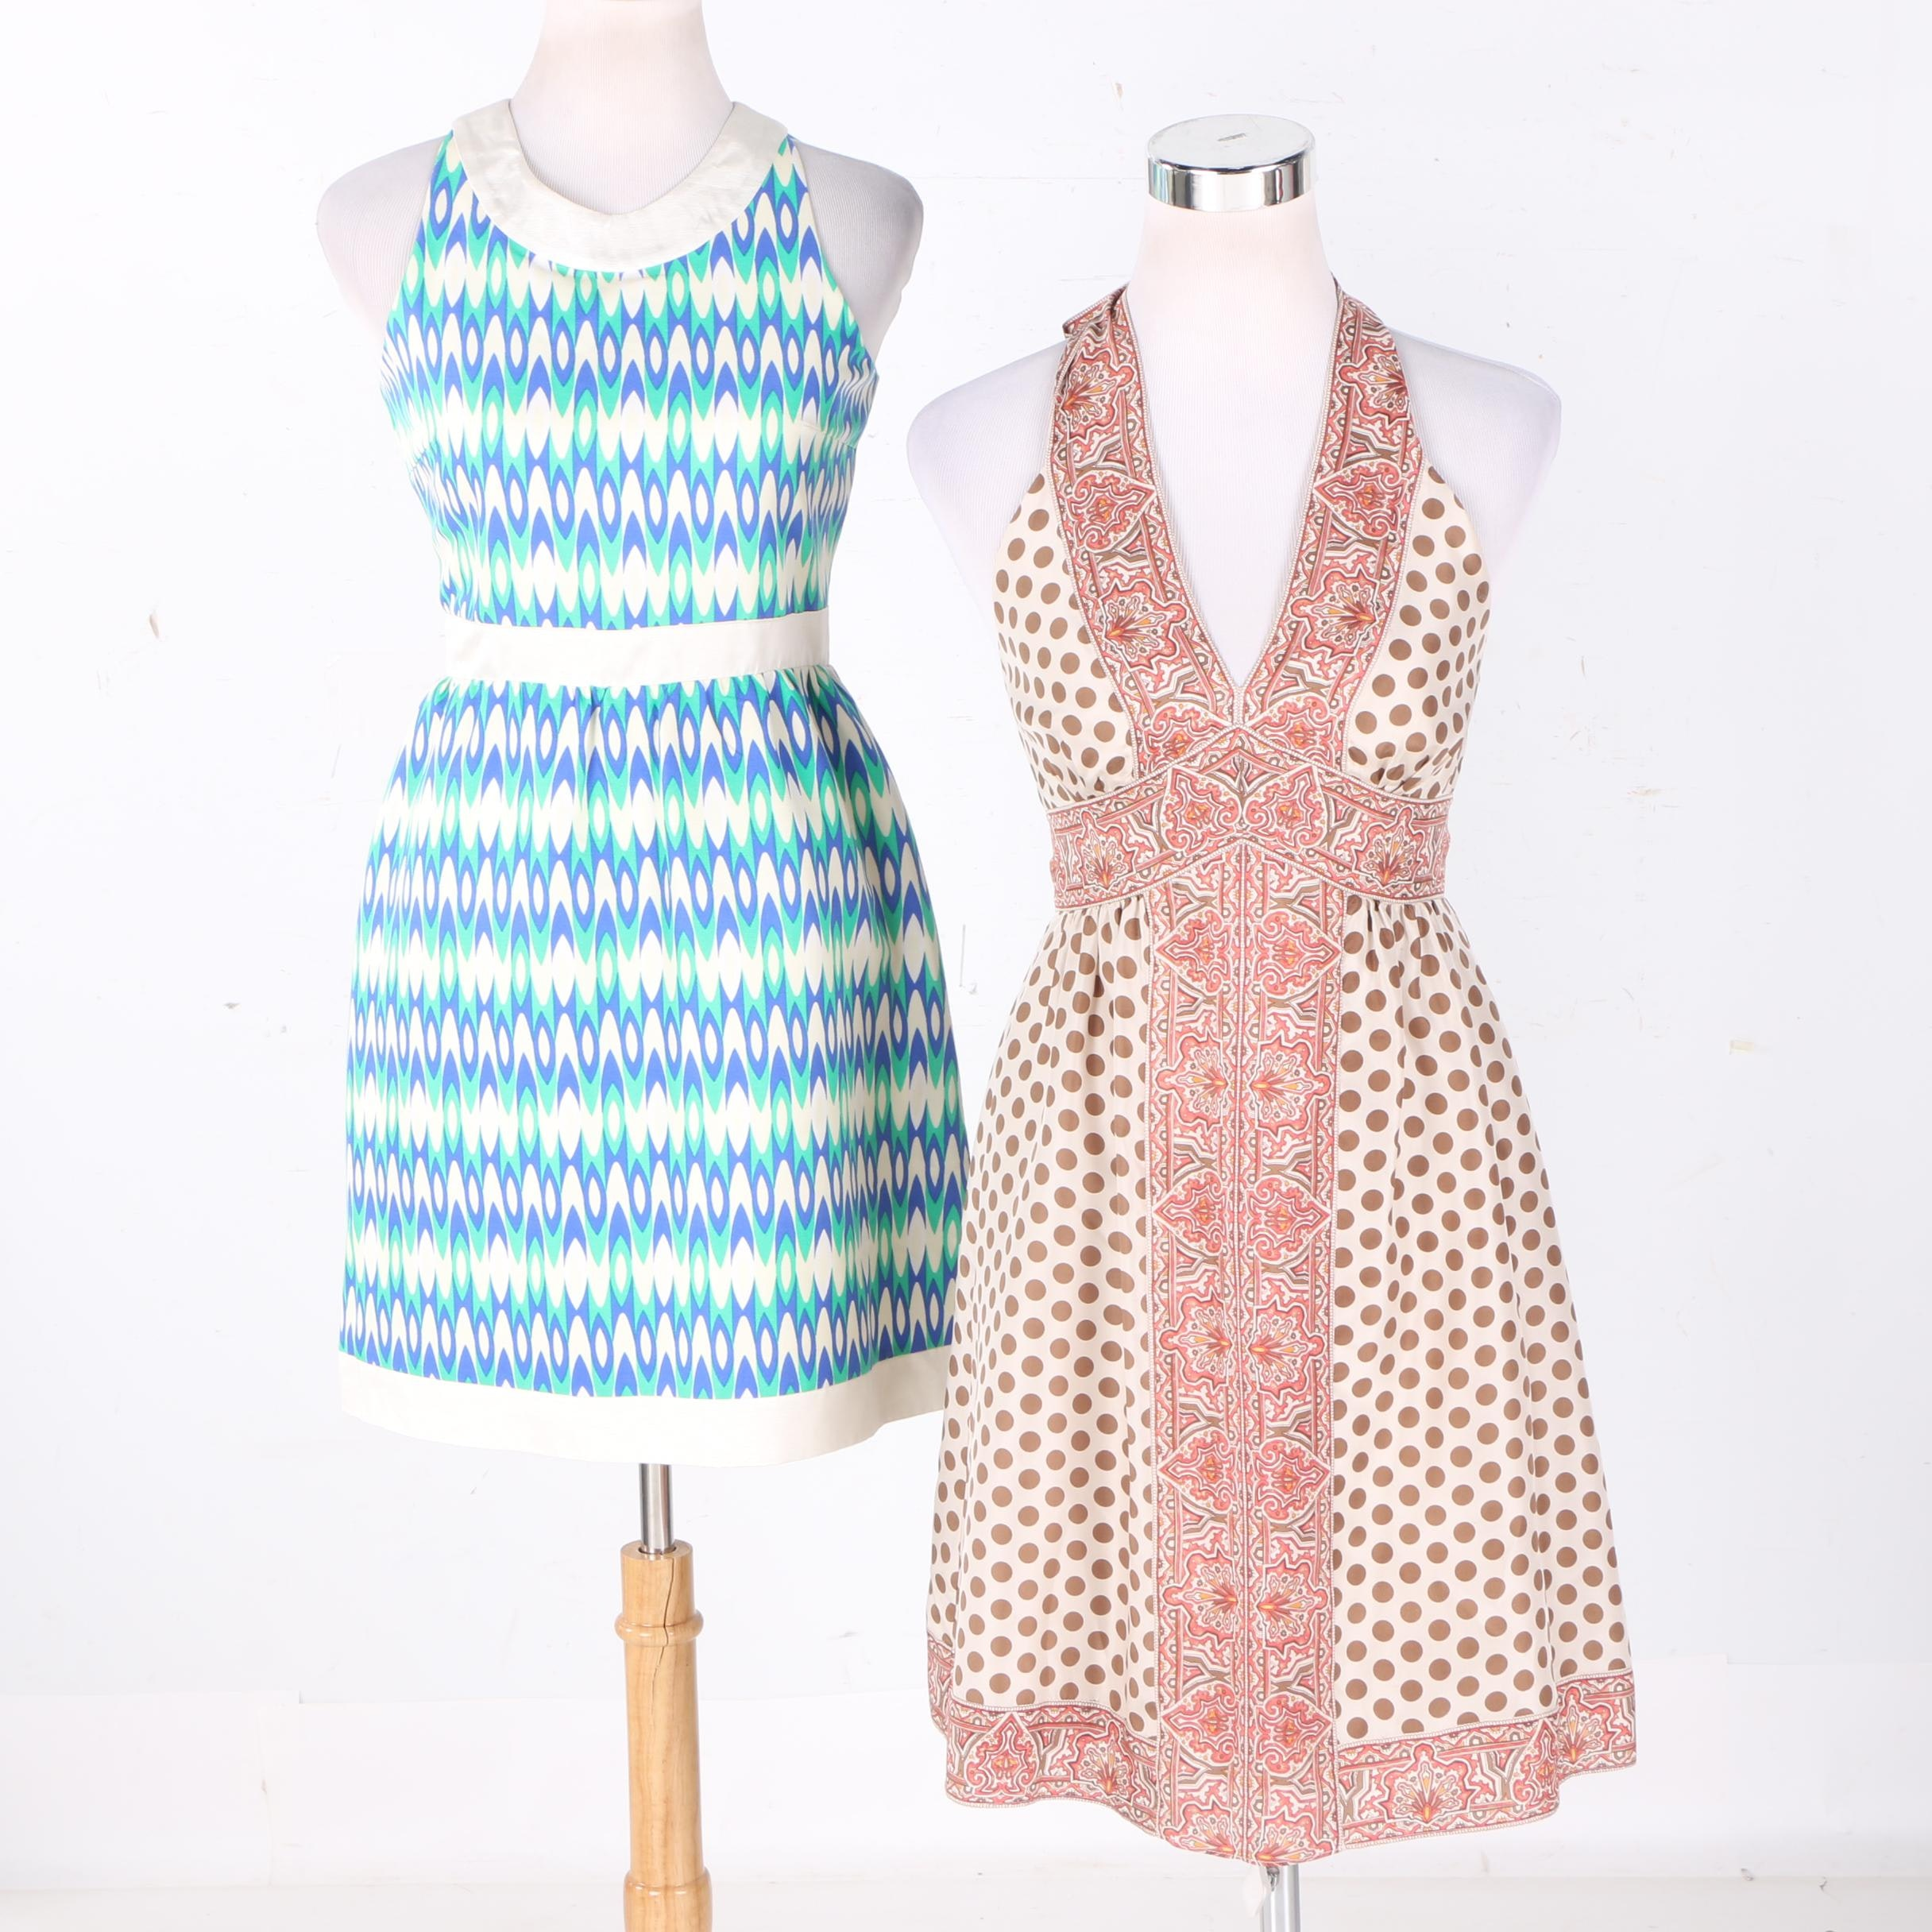 BCBGMaxazria and Julie Brown Sleeveless Dresses